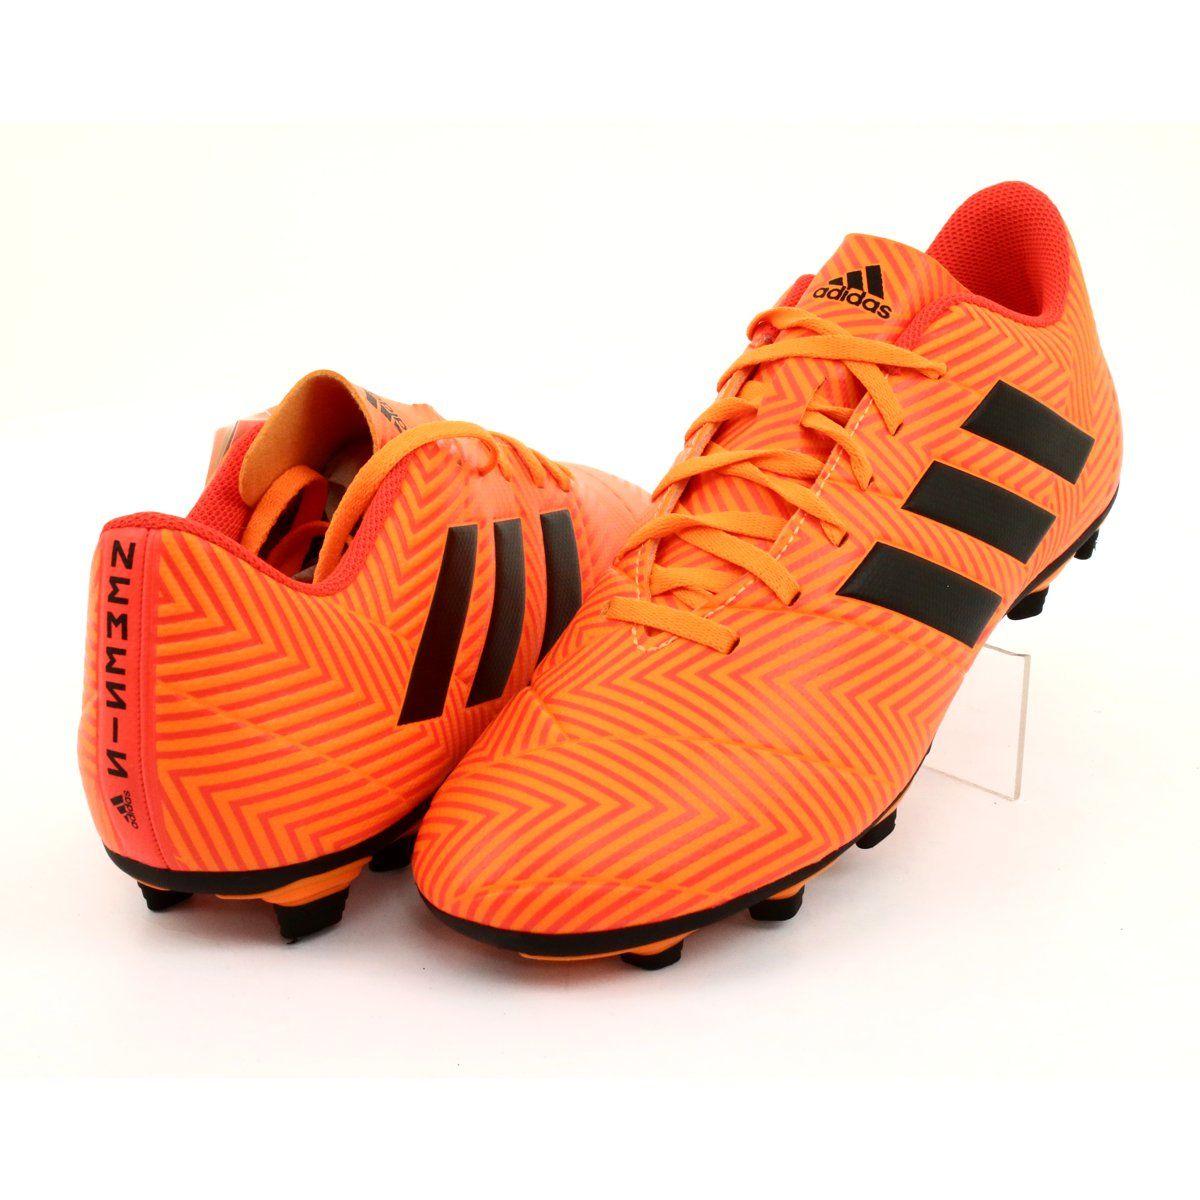 Buty Pilkarskie Adidas Nemeziz 18 4 Fxg M Da9594 Pomaranczowe Football Shoes Shoes Adidas Shoes